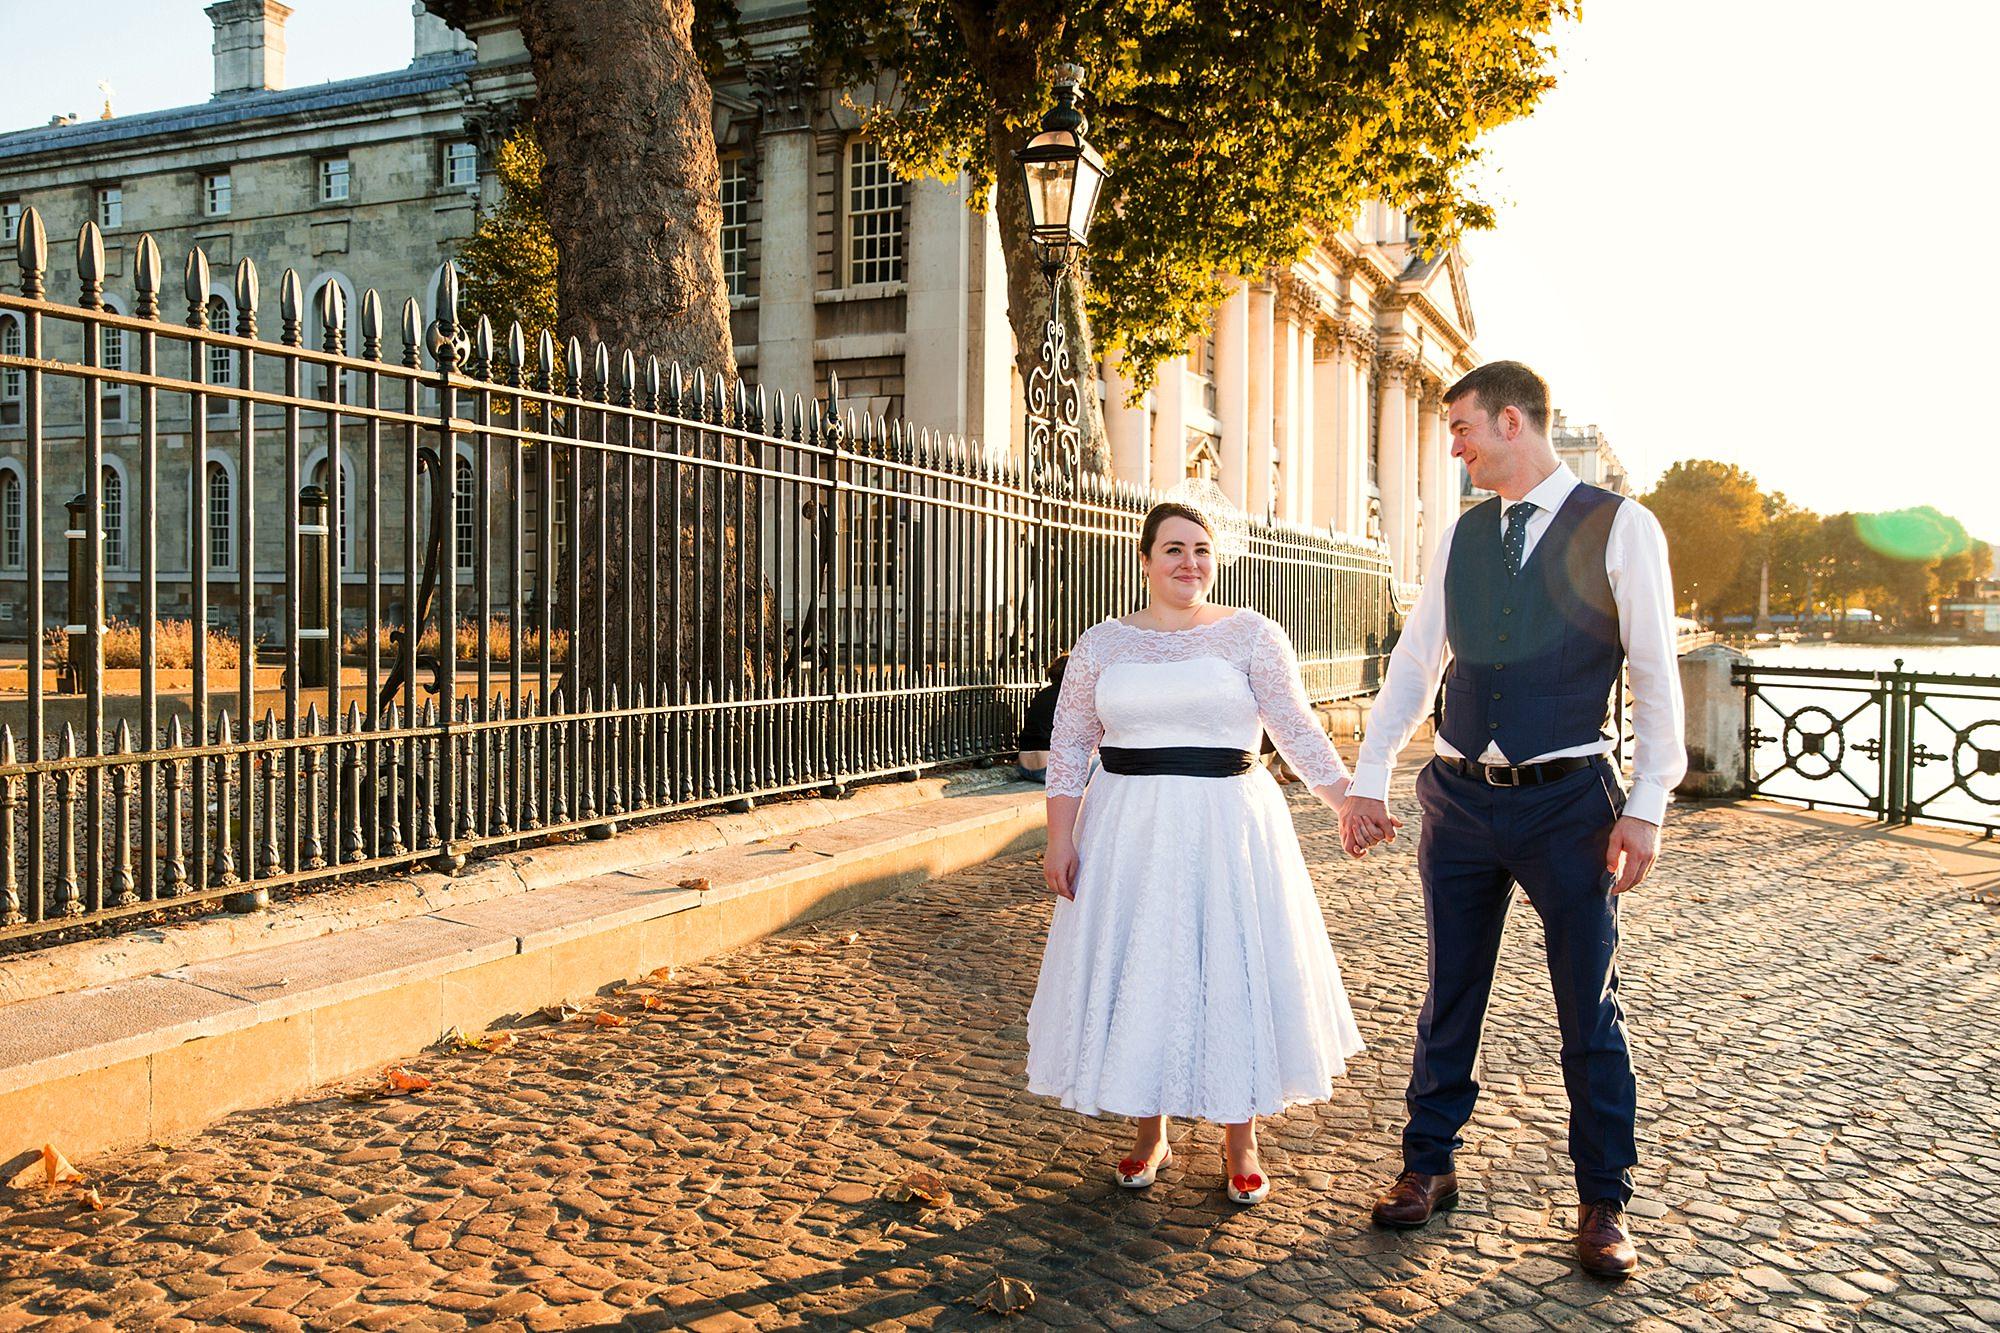 Trafalgar Tavern wedding bride and groom during golden hour in London